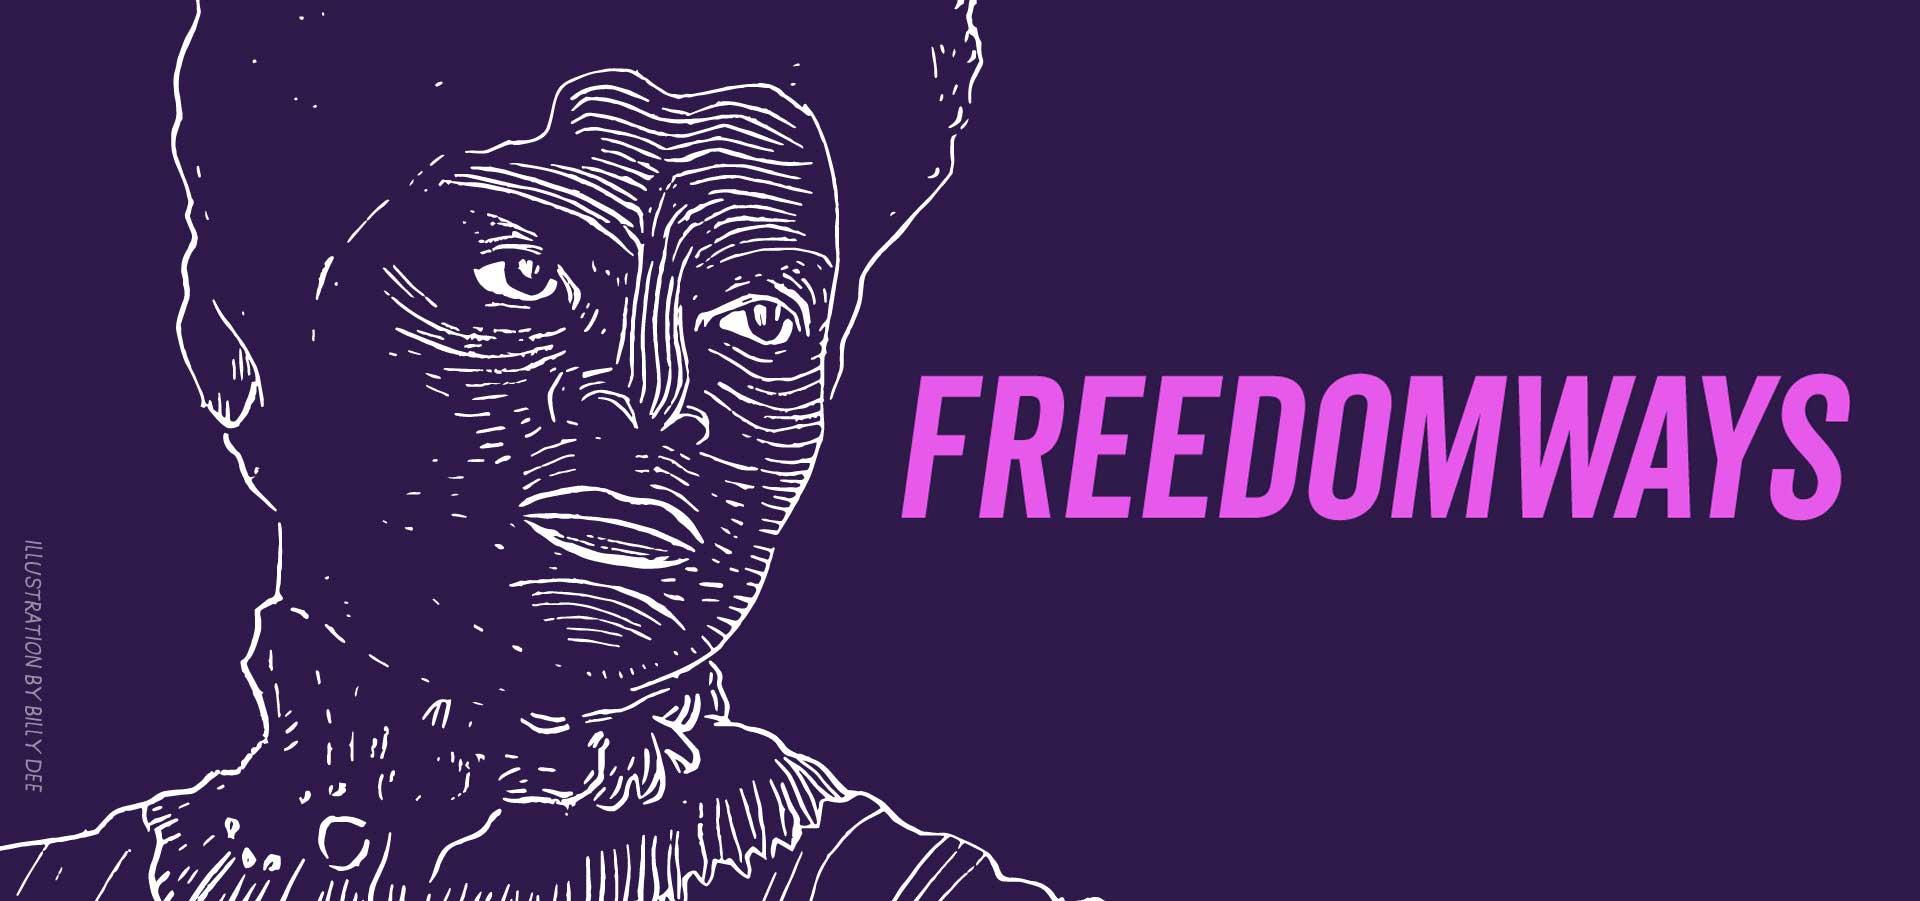 Freedomways